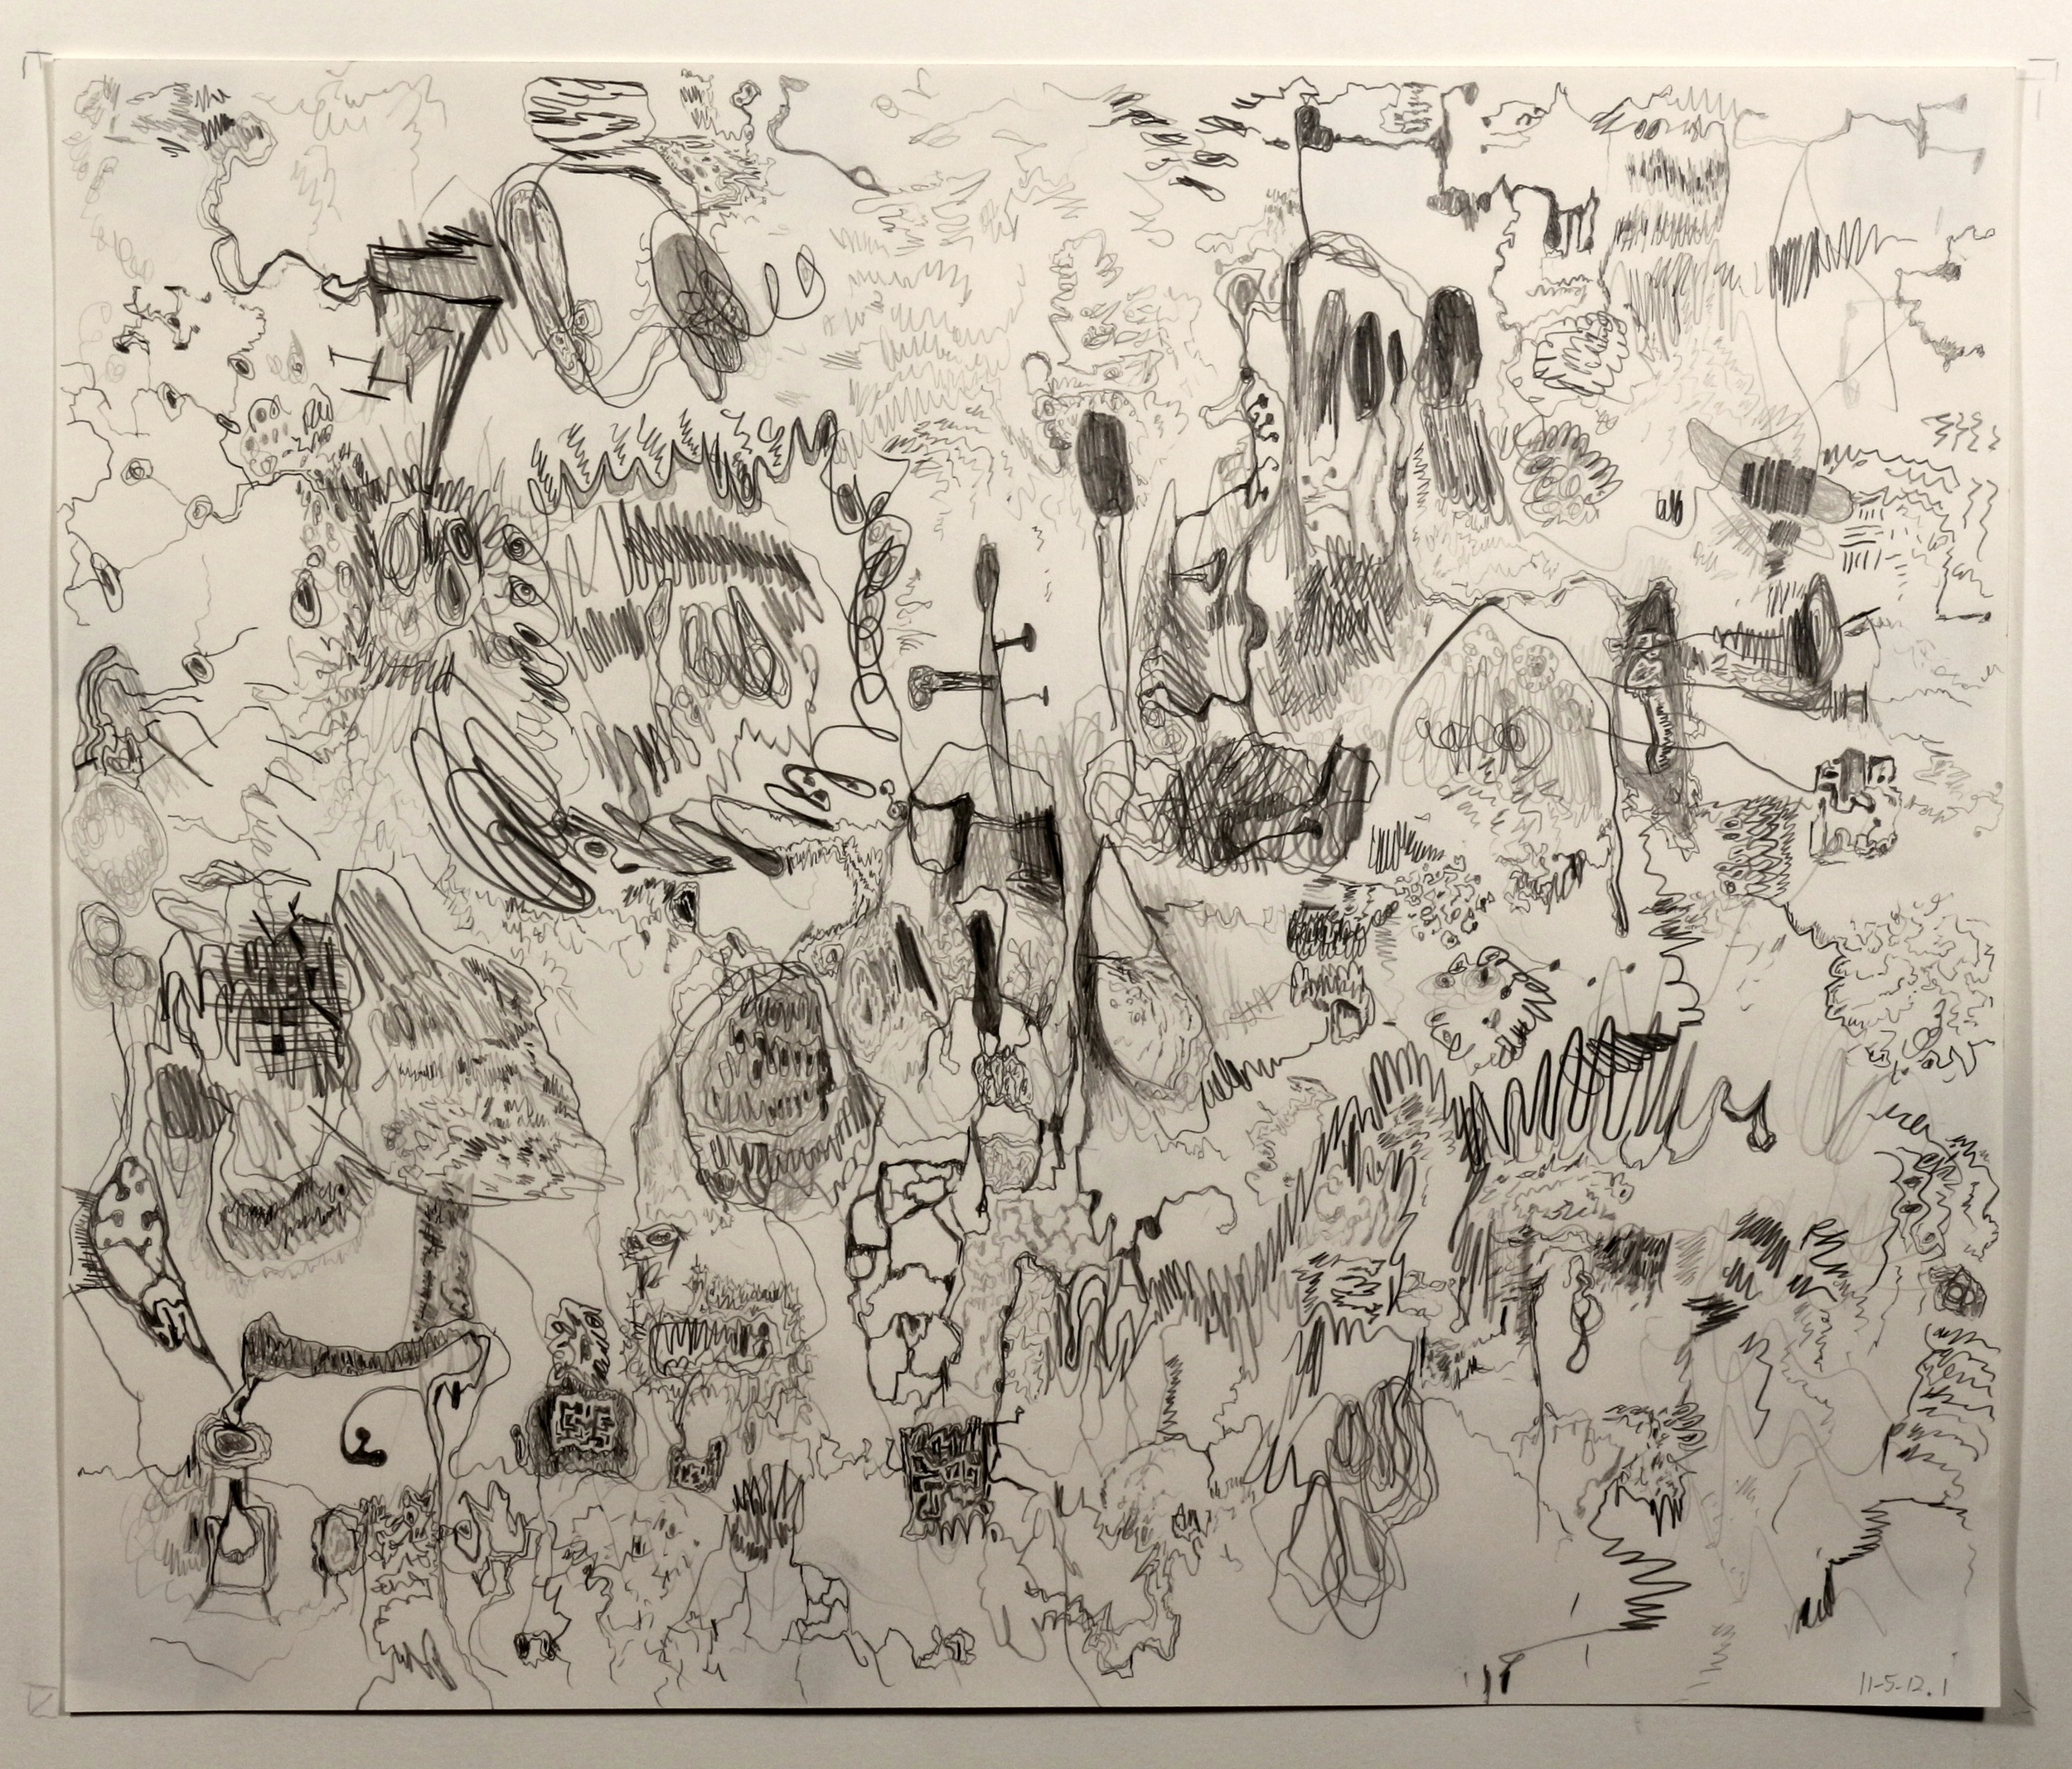 Untitled (11-5-12.1)